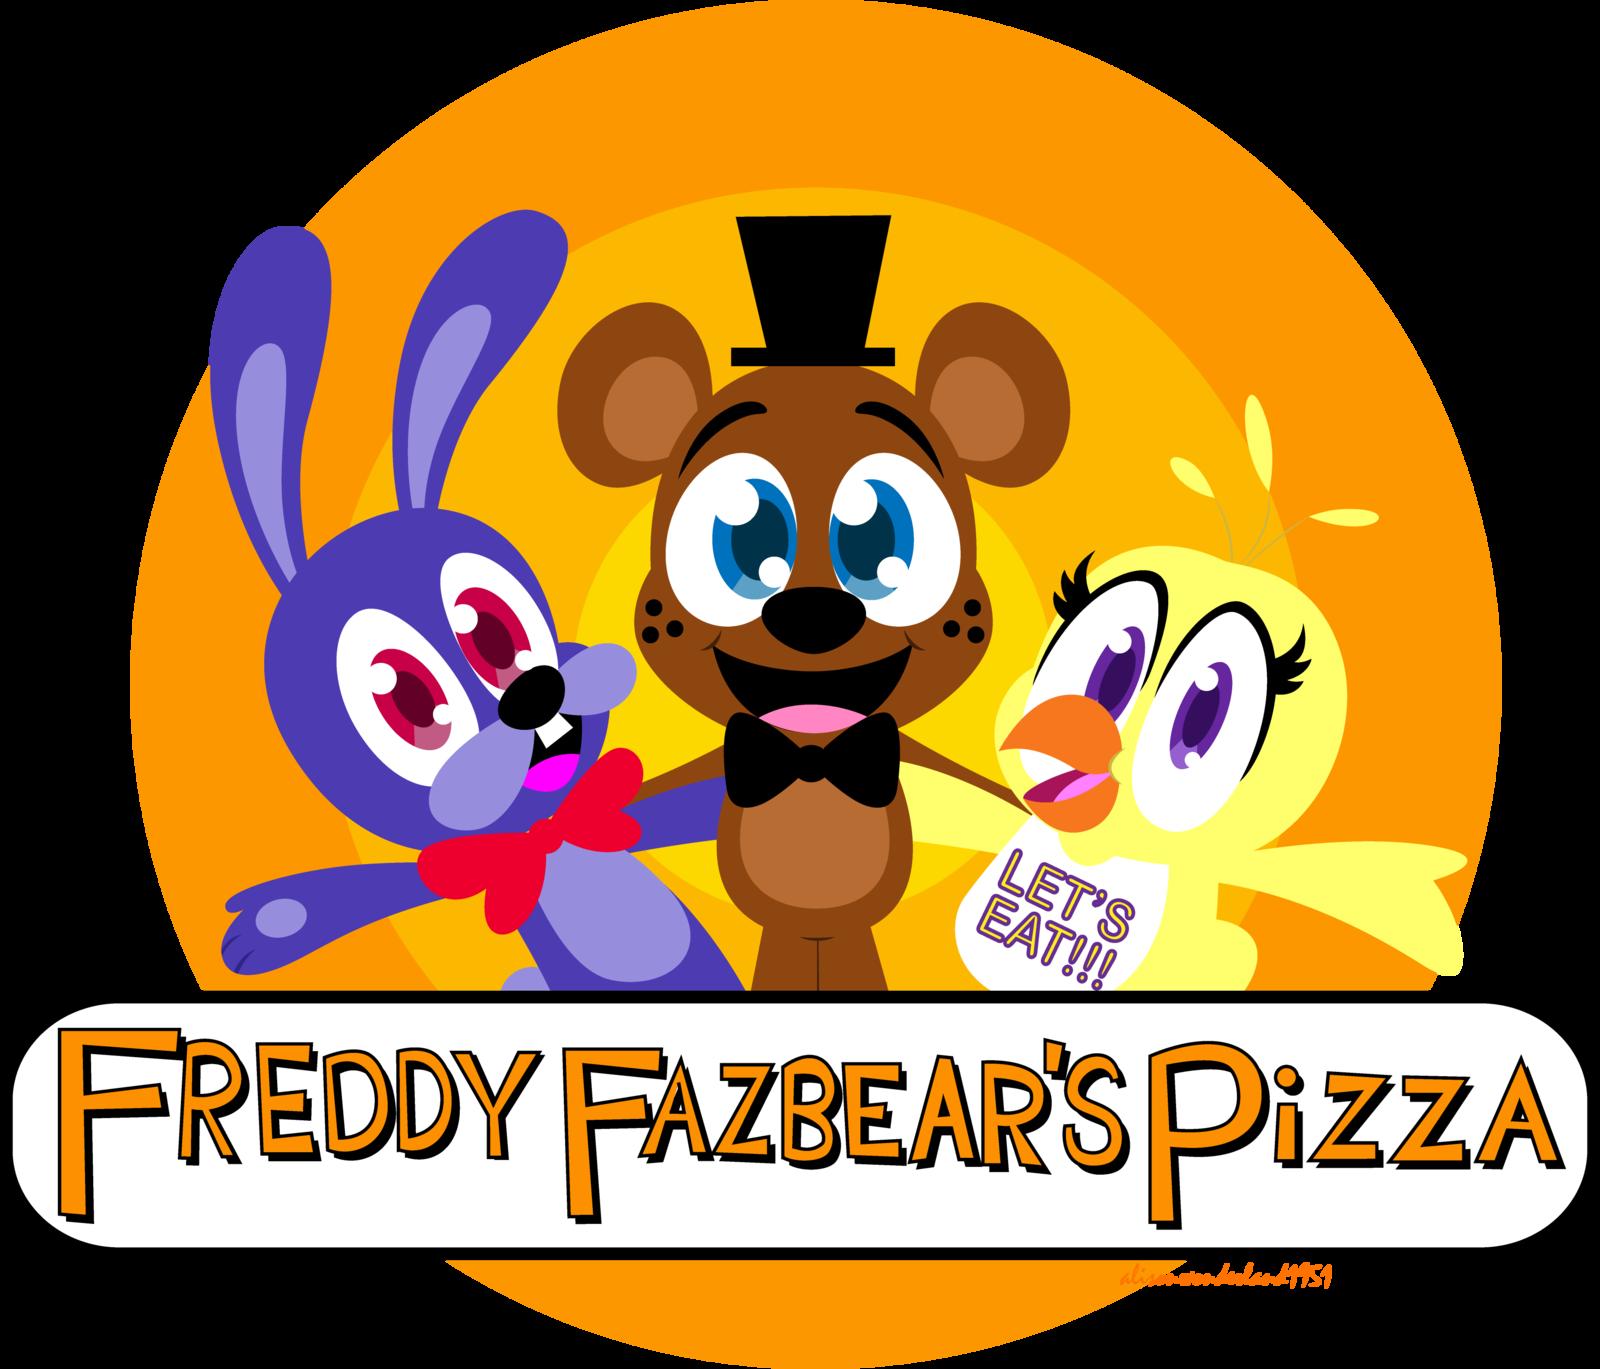 Freddy frazbears pizza phone number - Freddy Fazbear S Pizza Logo By Alisonwonderland1951 Deviantart Com